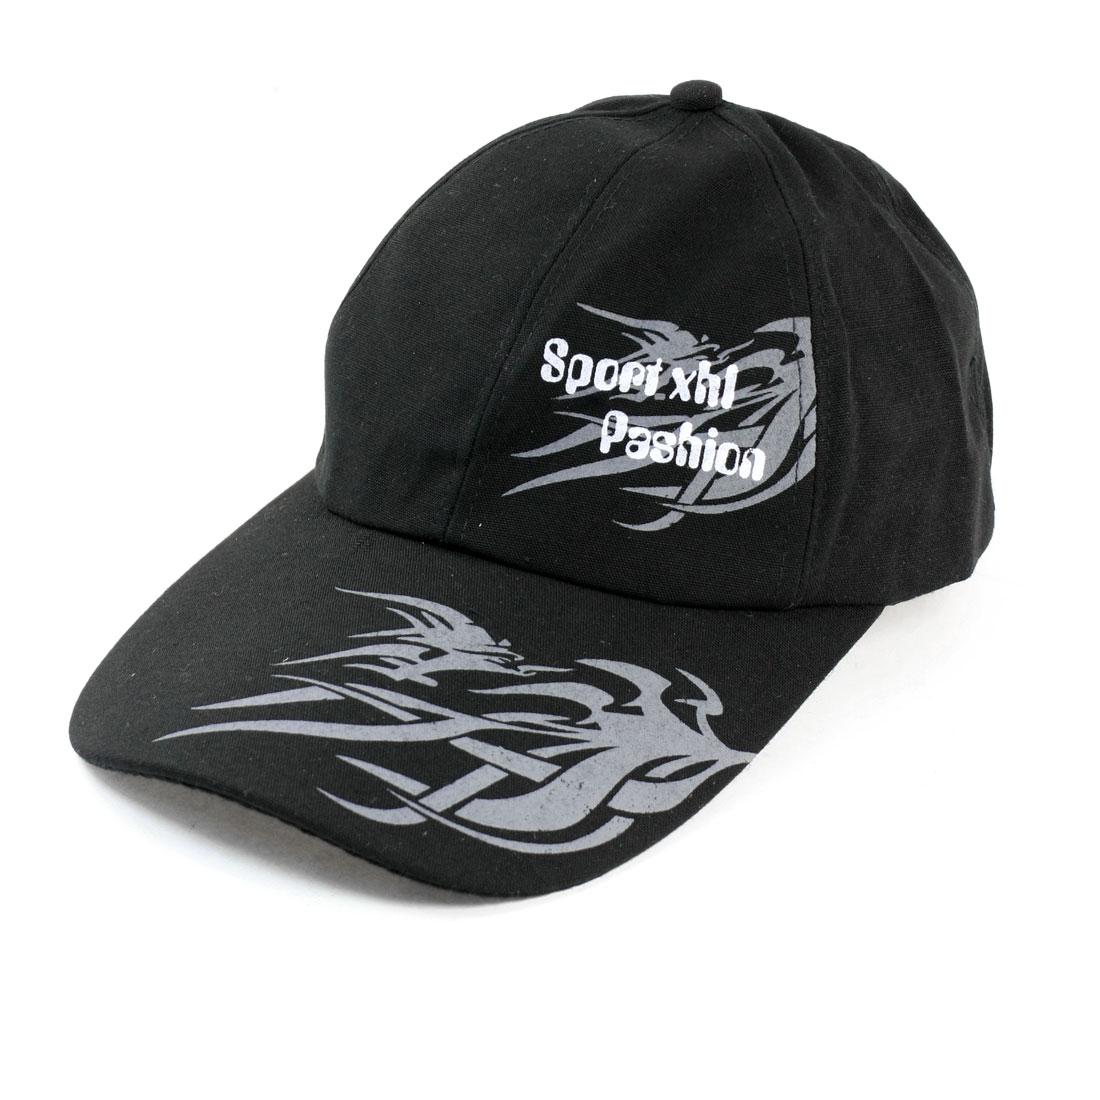 Adjustable Flame Printed Casquette Sun Visor Hat Cap Black for Ladies Man